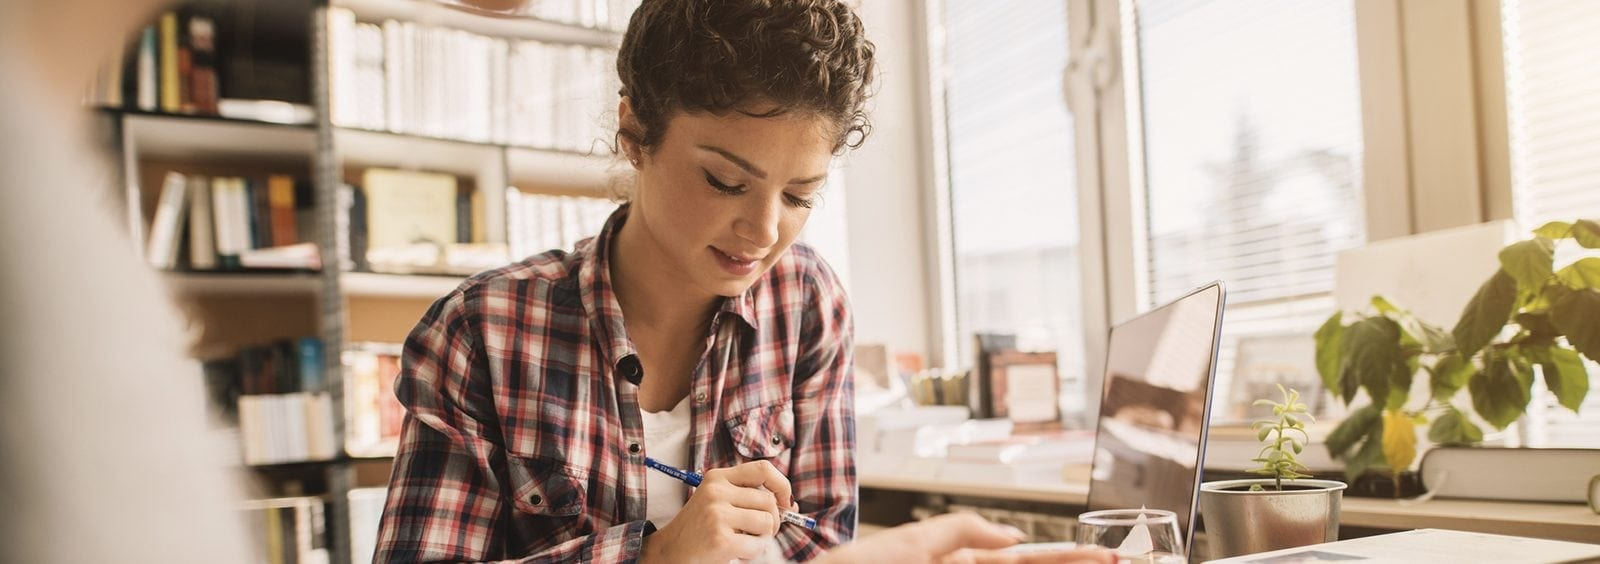 6 Ways to Maximize Study Time and Minimize Stress